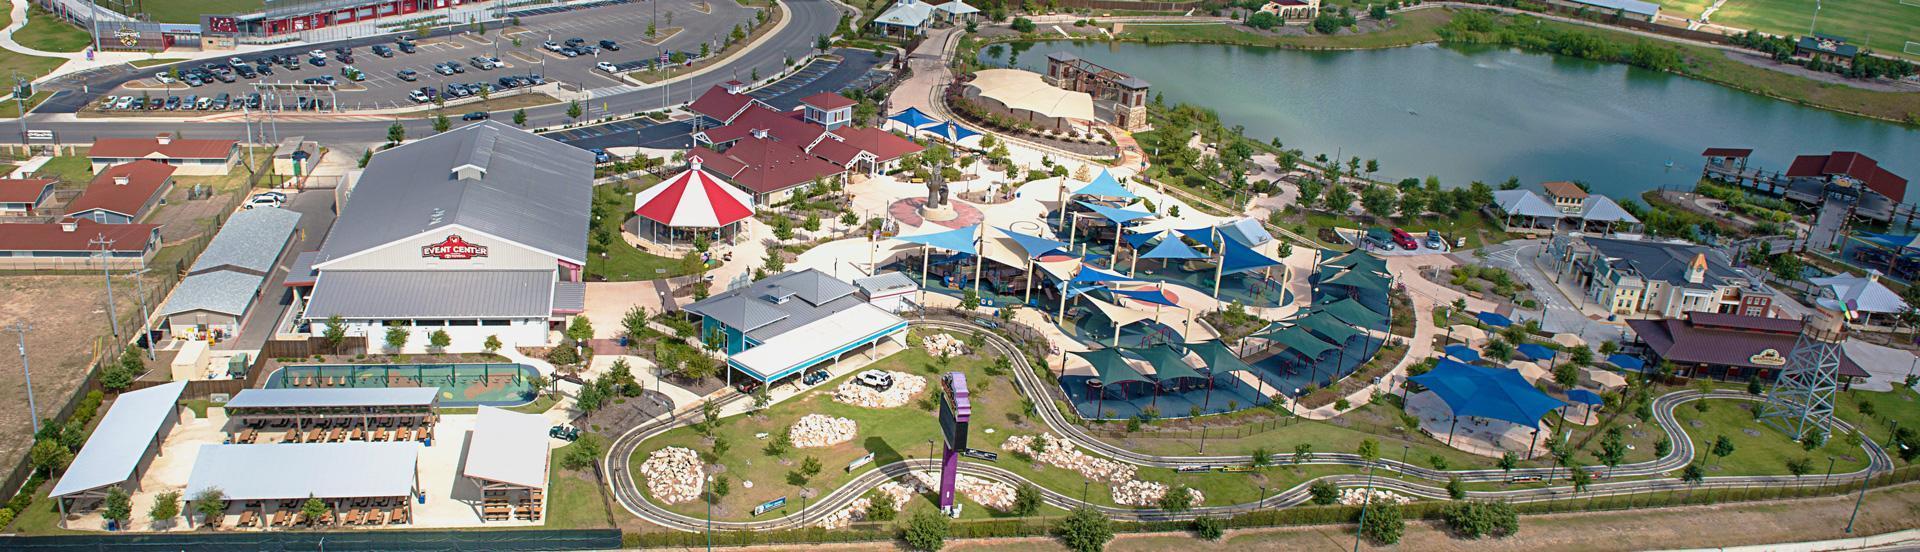 Morgan's Wonderland San Antonio Aerial View